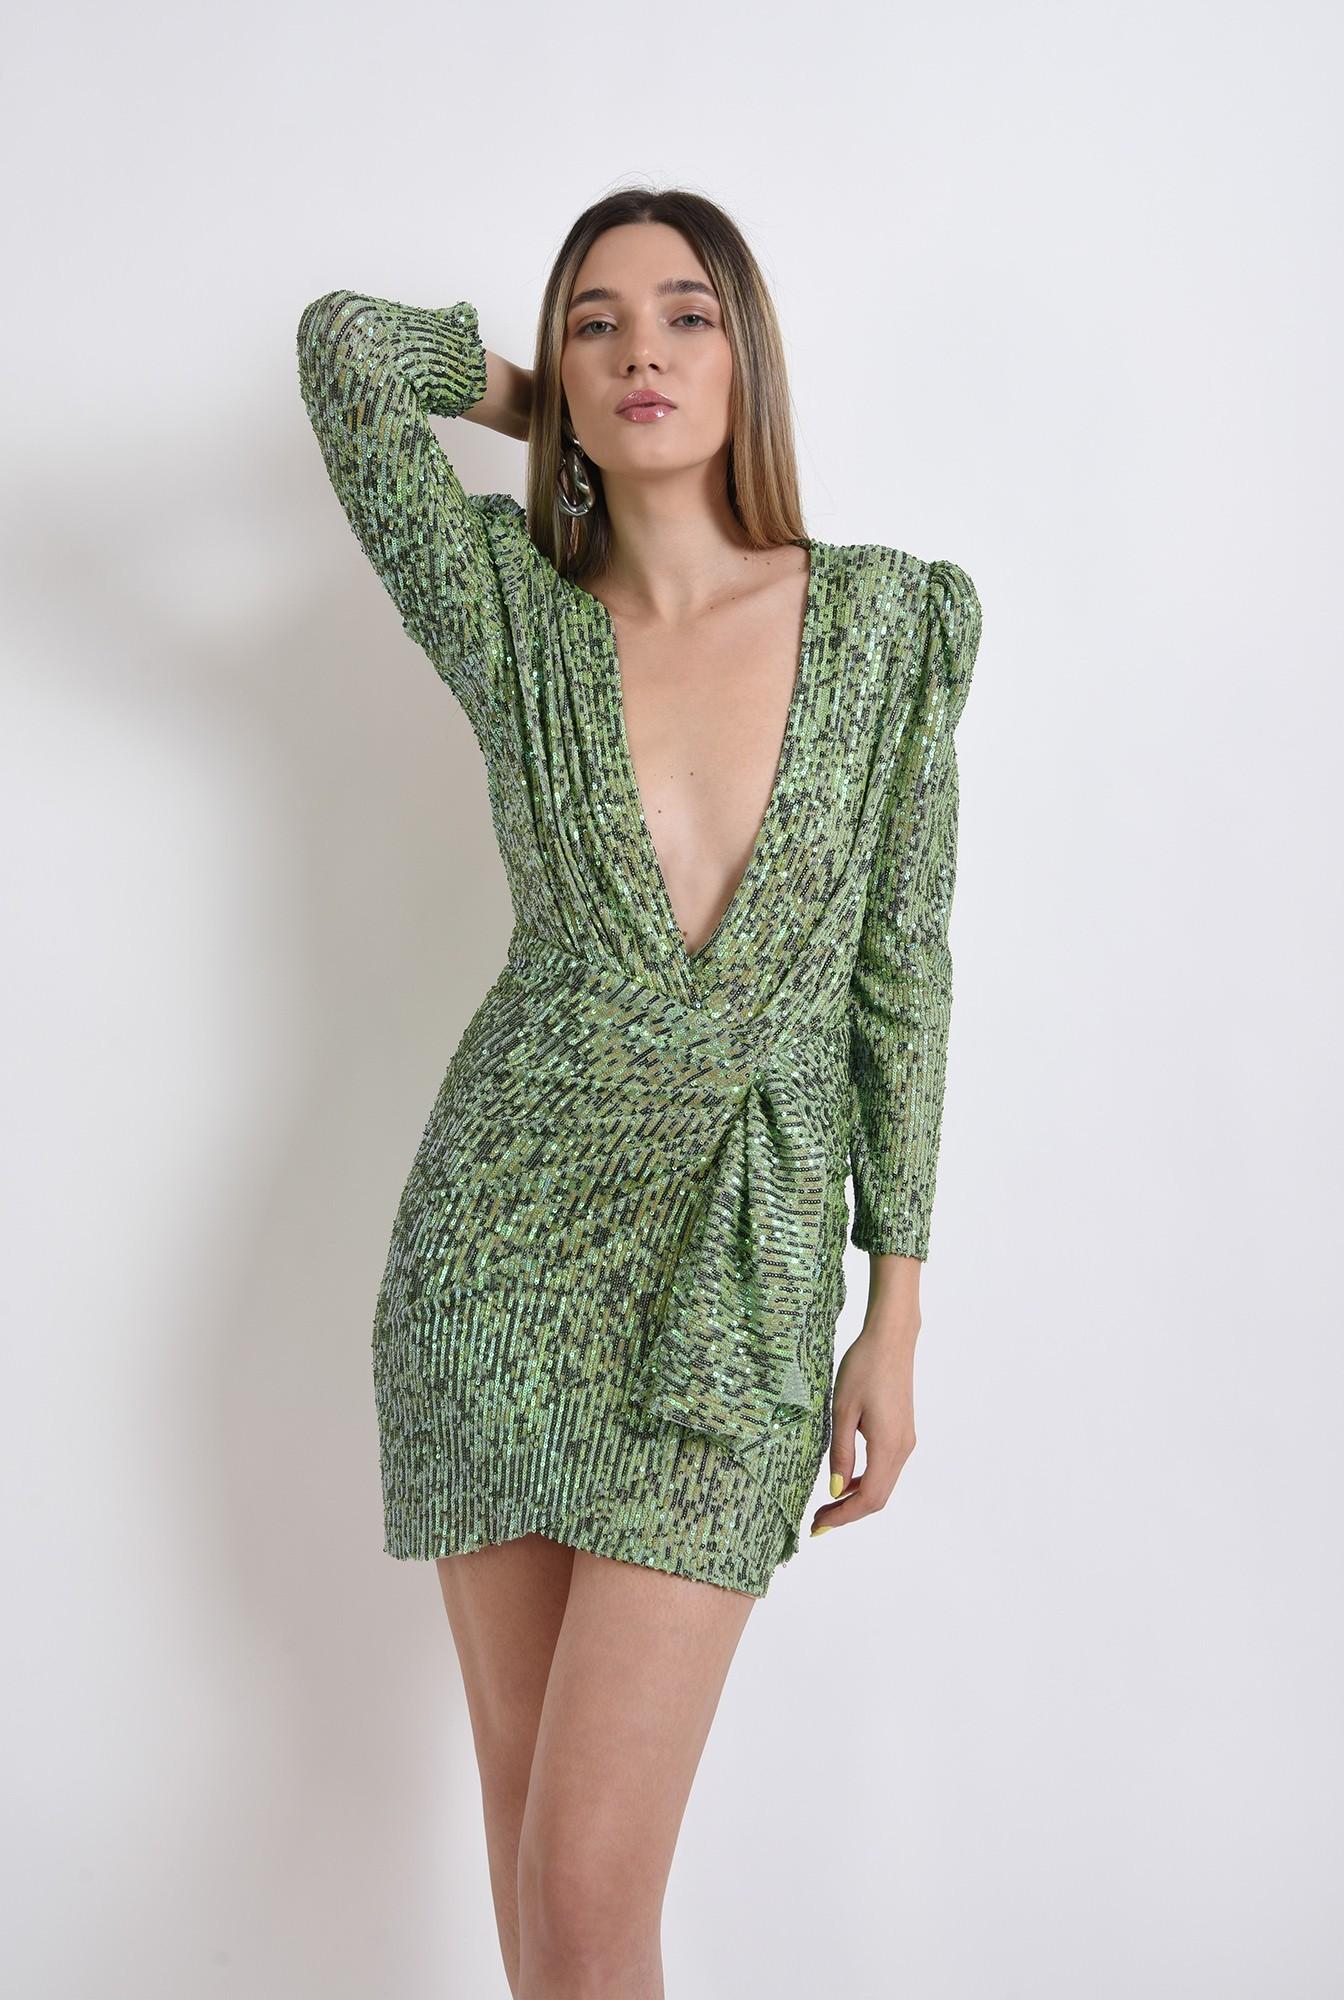 0 - rochie scurta, eleganta, paiete, decolteu adanc, verde